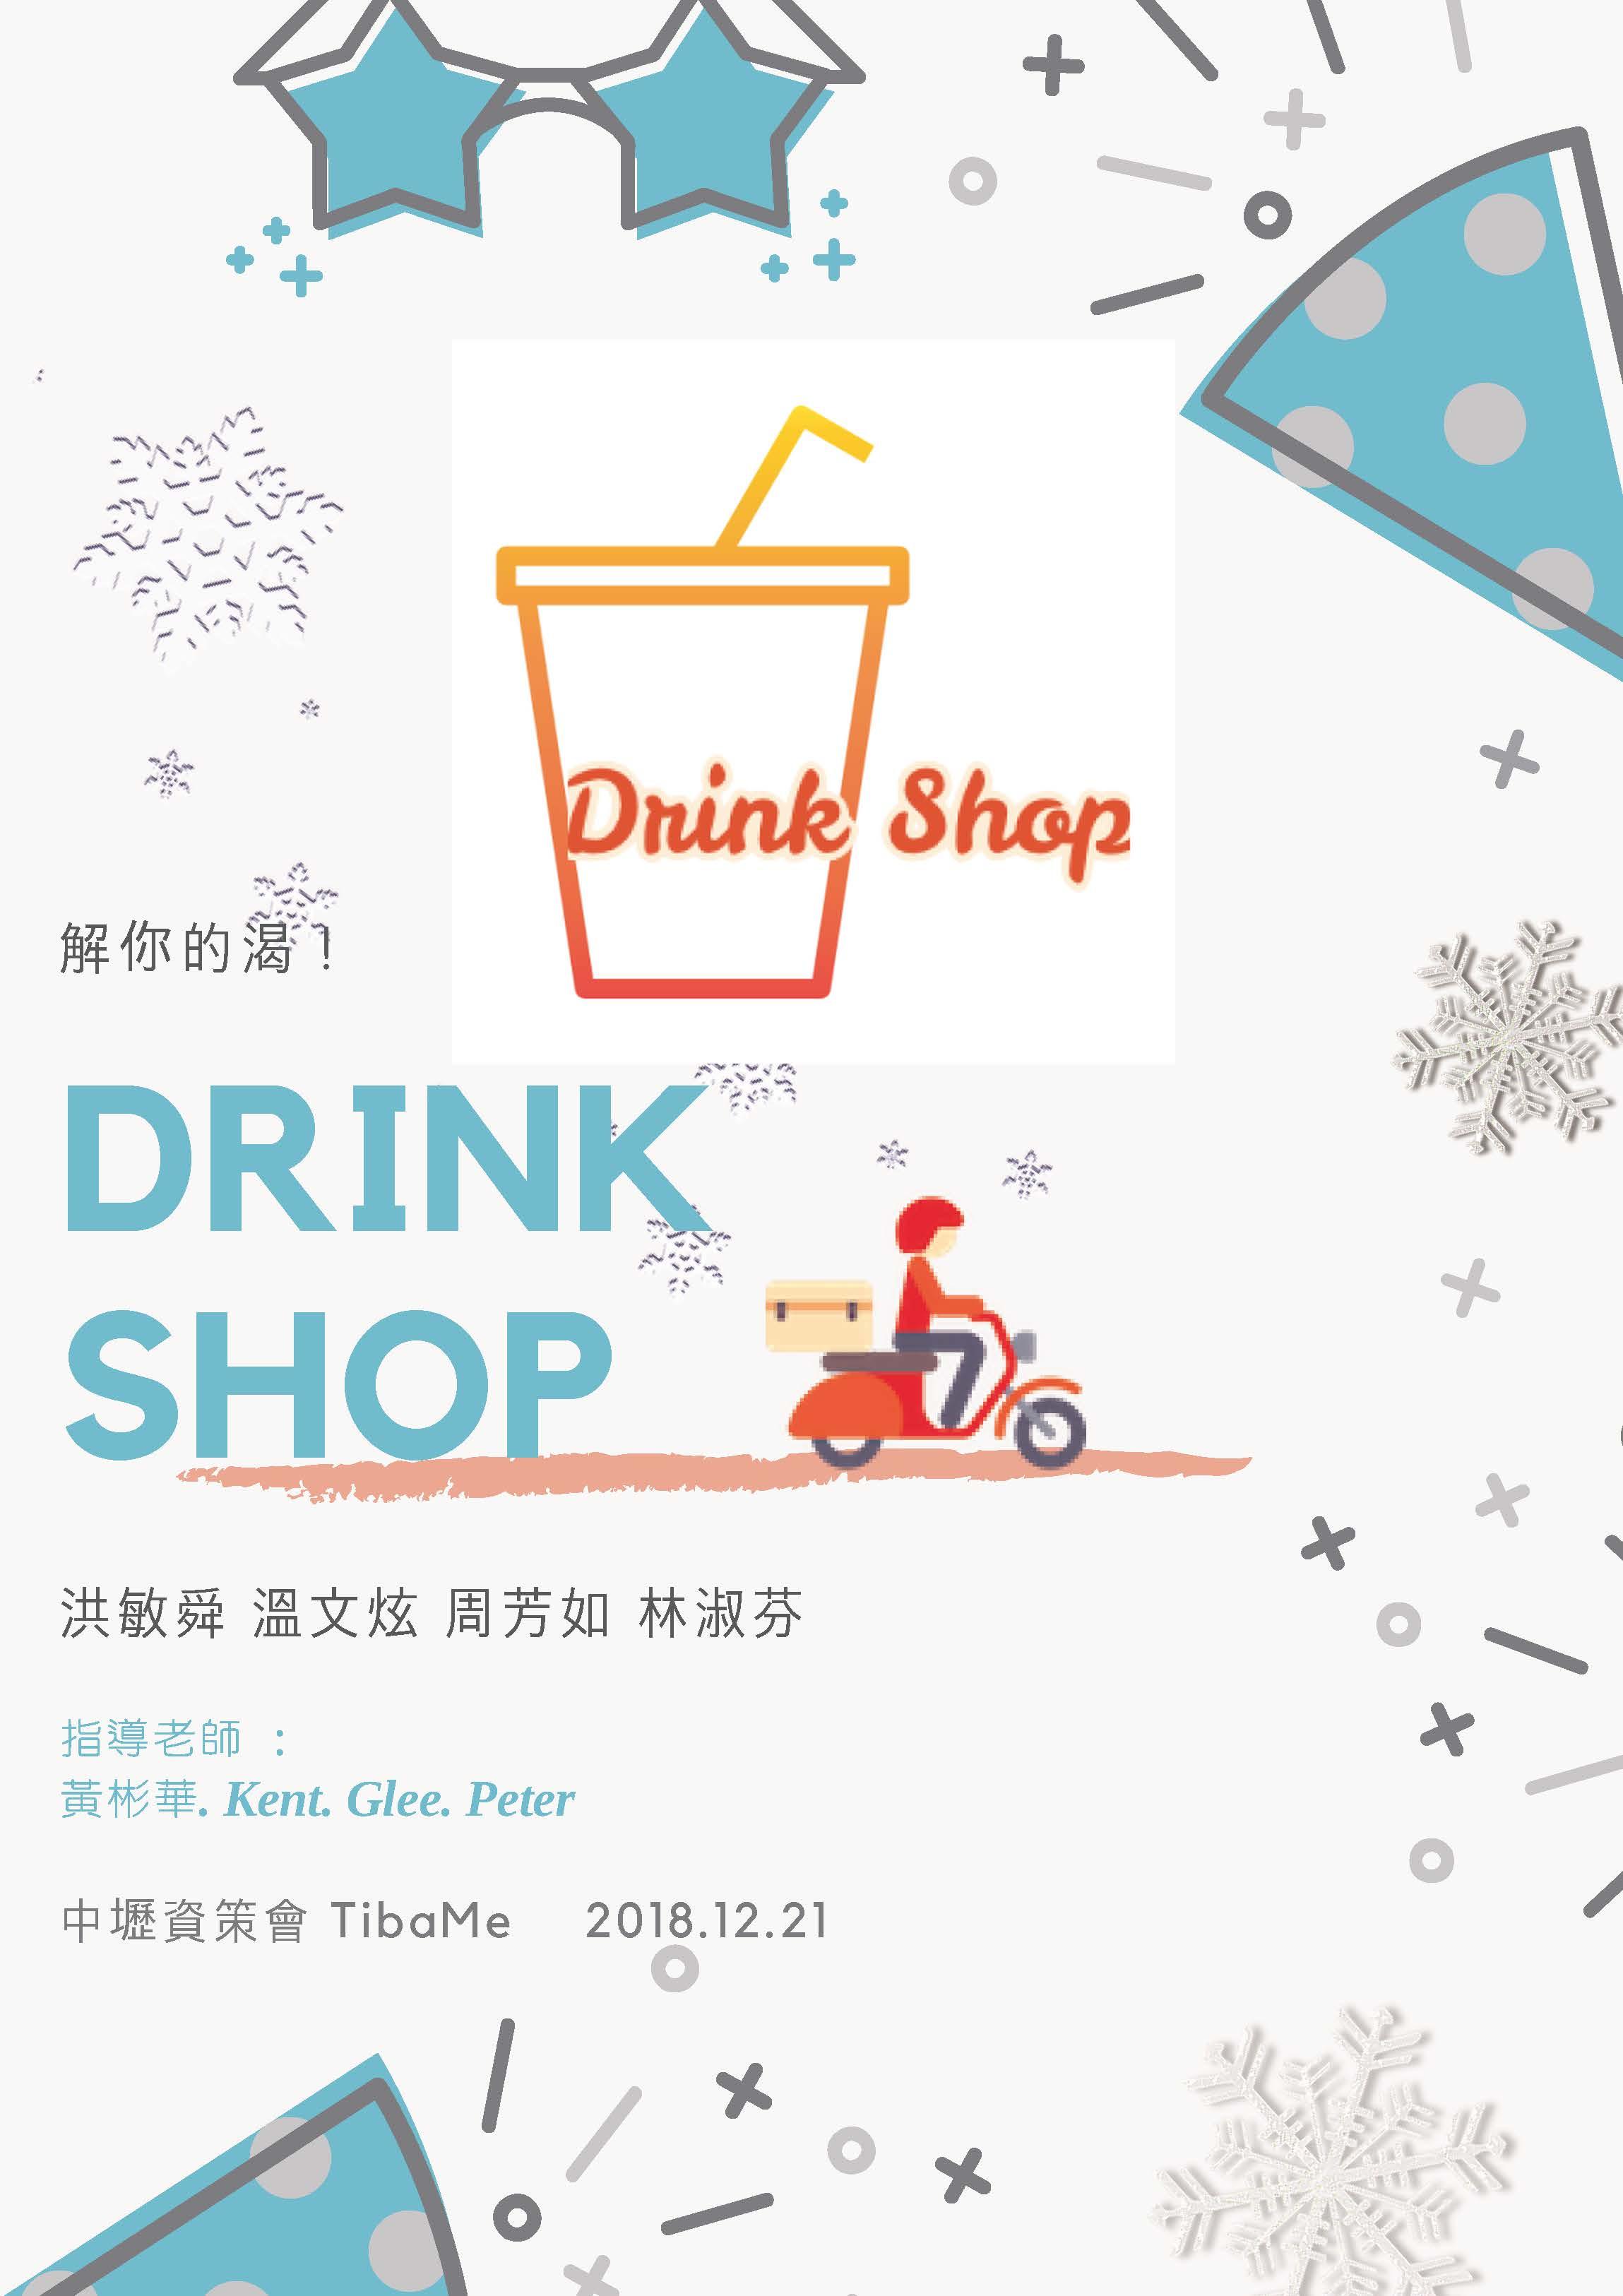 TibaMe_cp102第四組_DrinkShop(飲料商城)